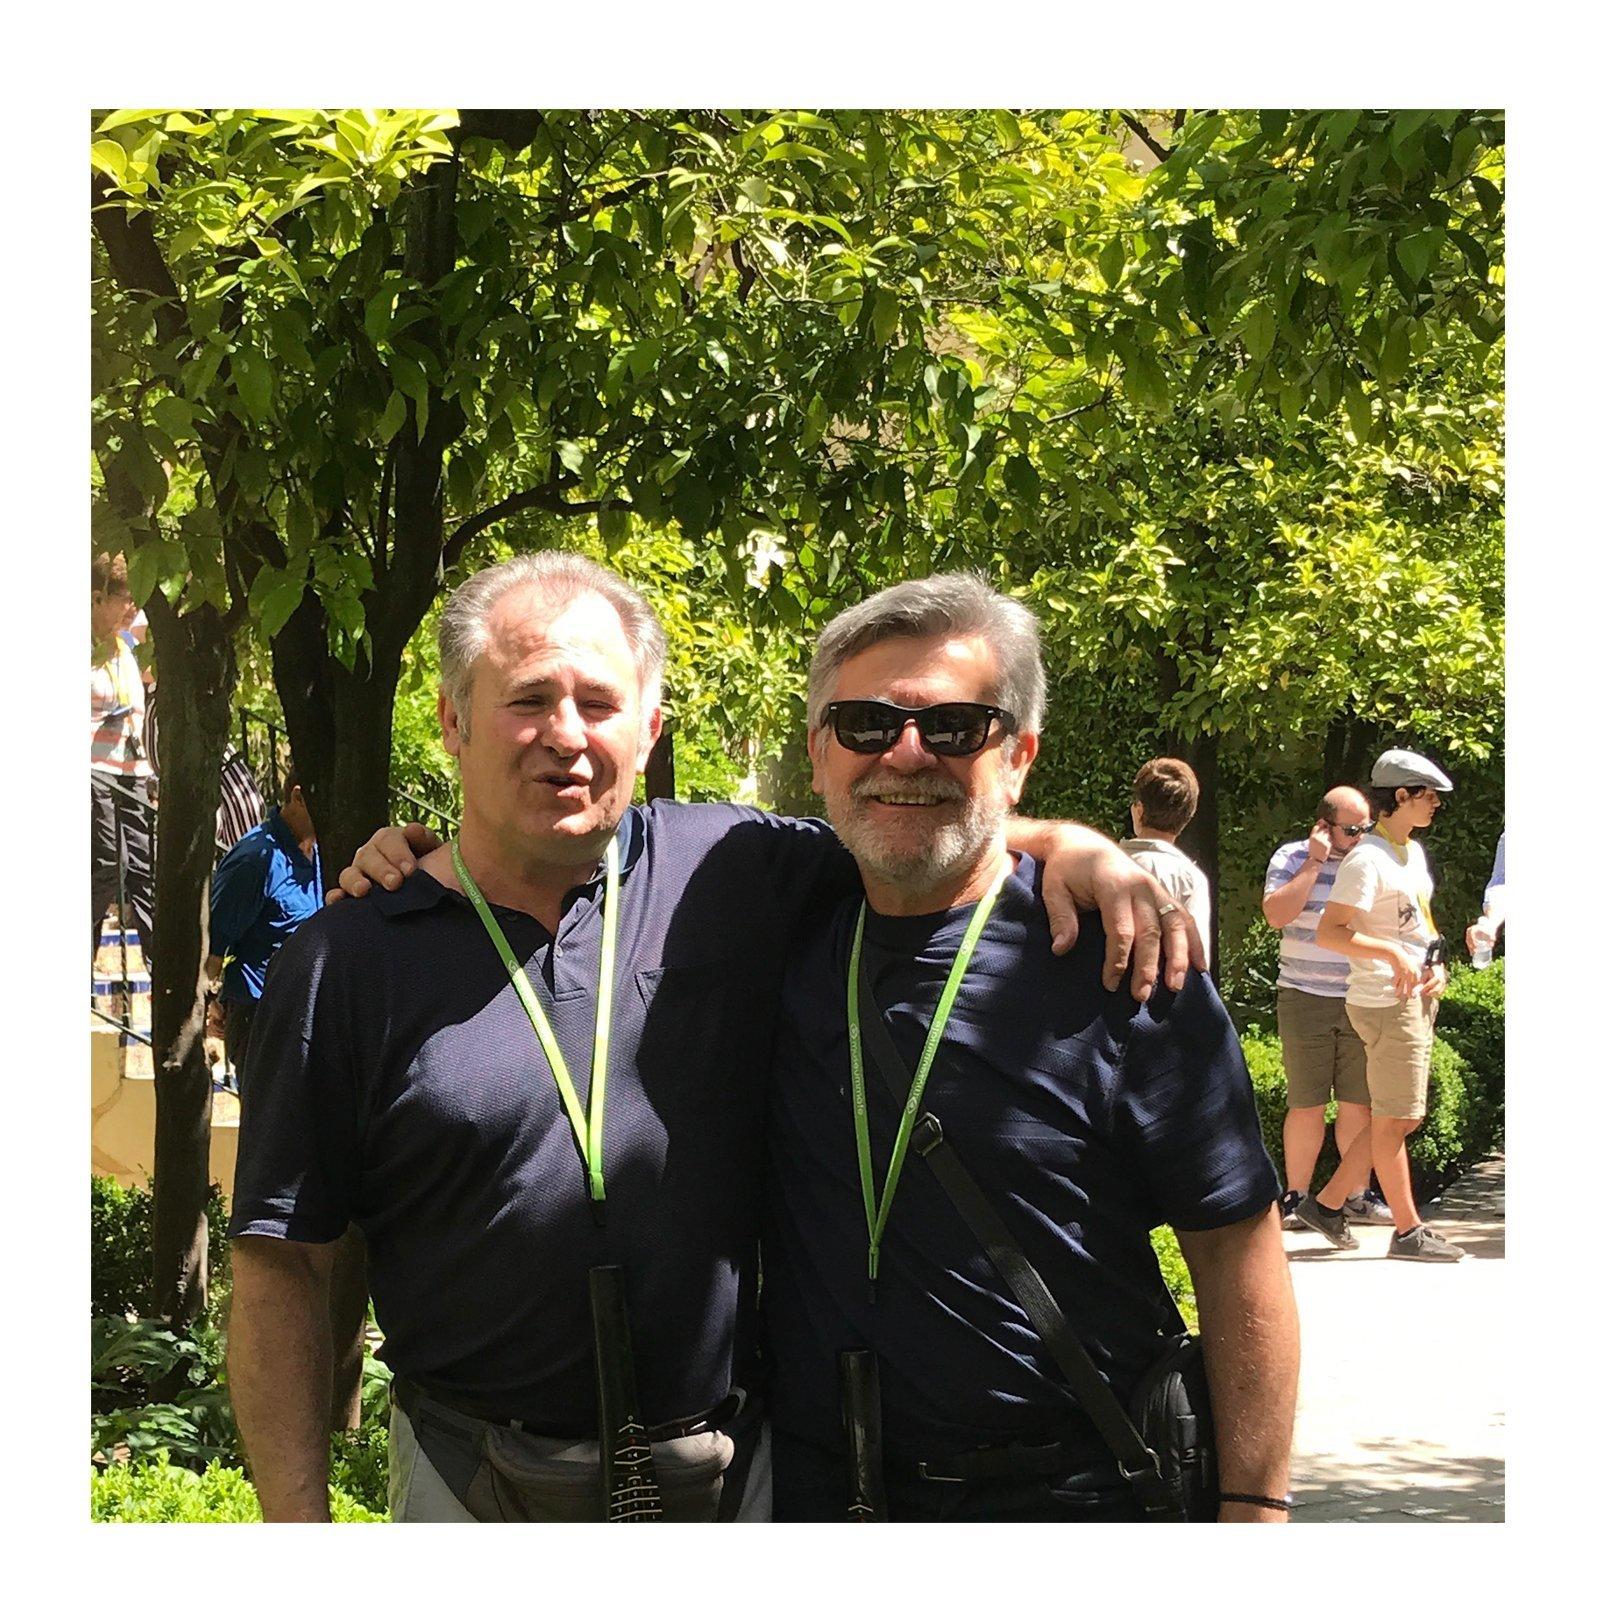 Creador de Productoen Sevilla, especialista en geometria 3D